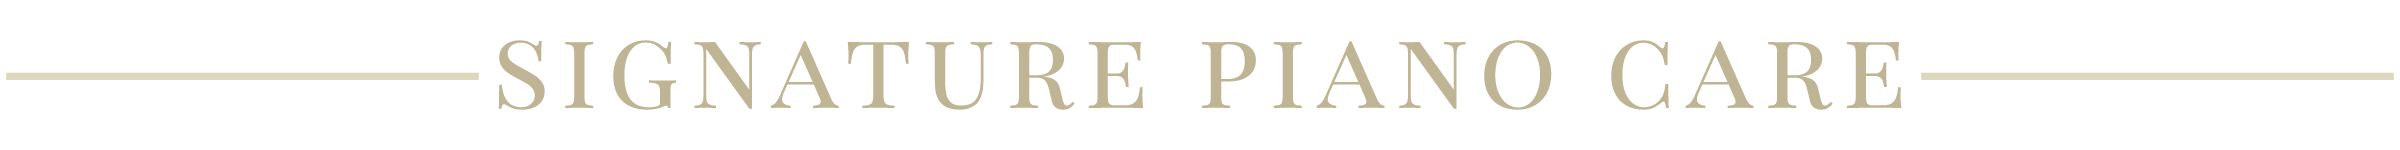 WLP_Transparent_SPC_SeparateTagline.png